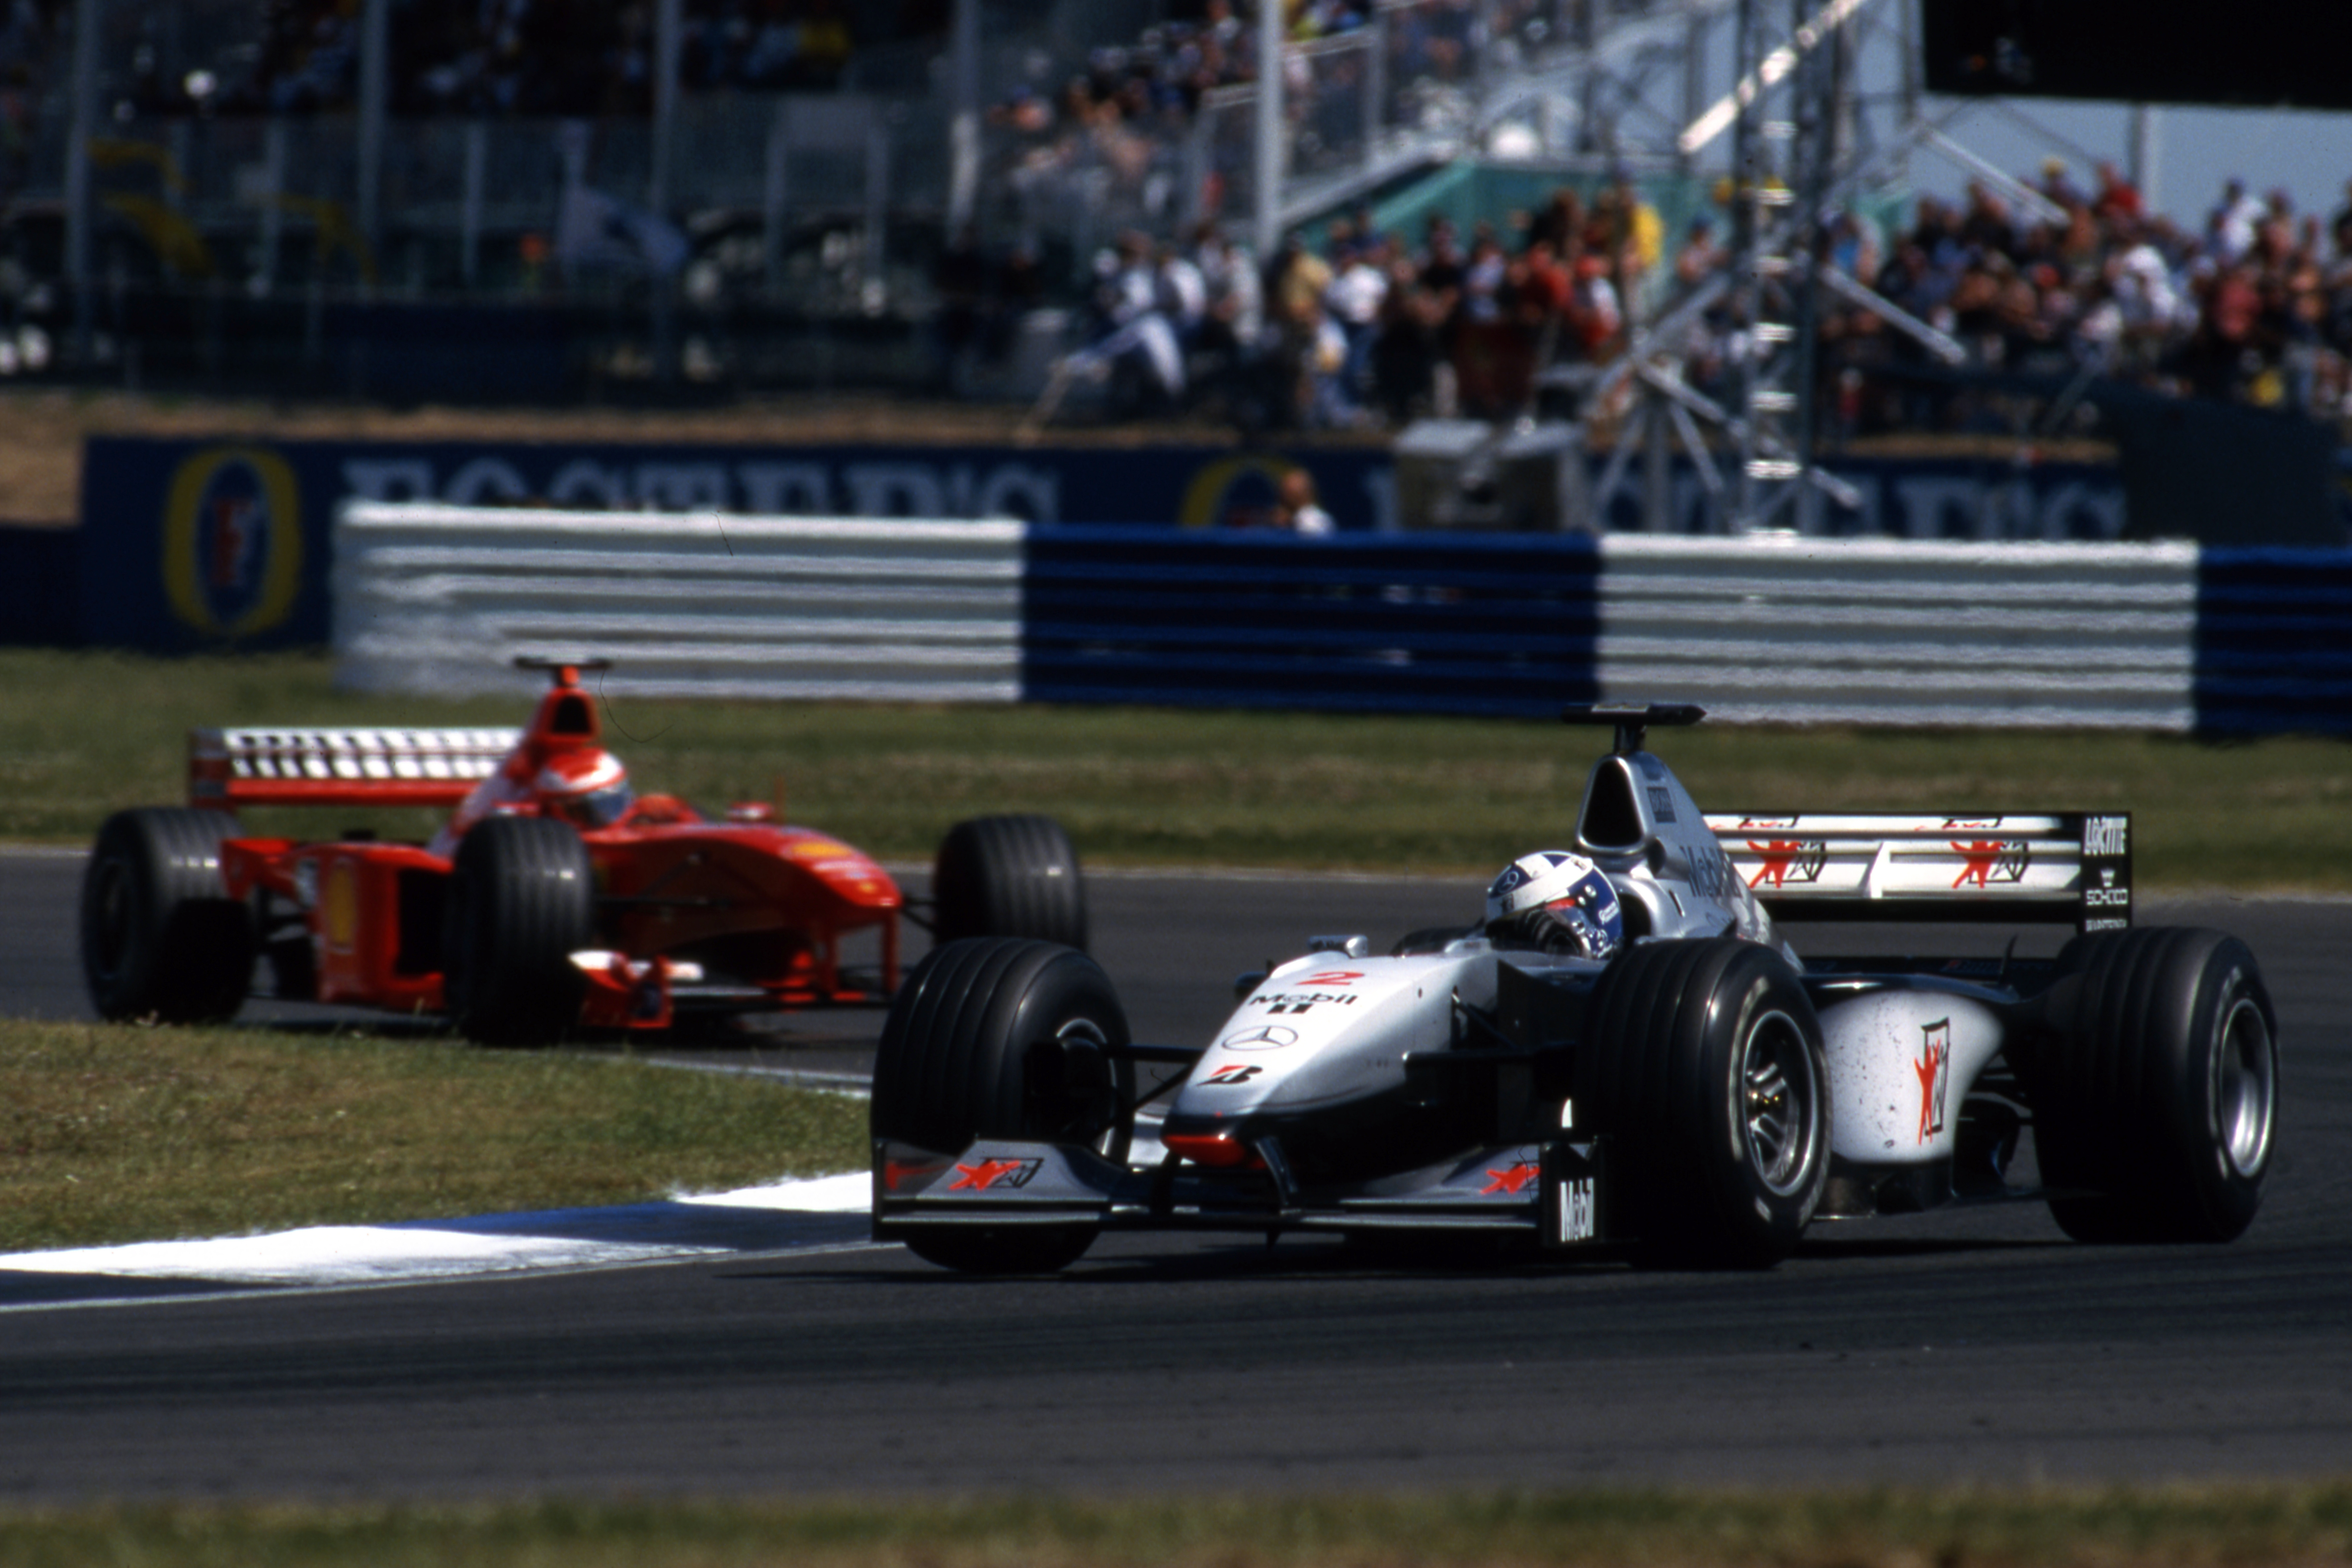 British Grand Prix Silverstone (gbr) 09 11 07 1999